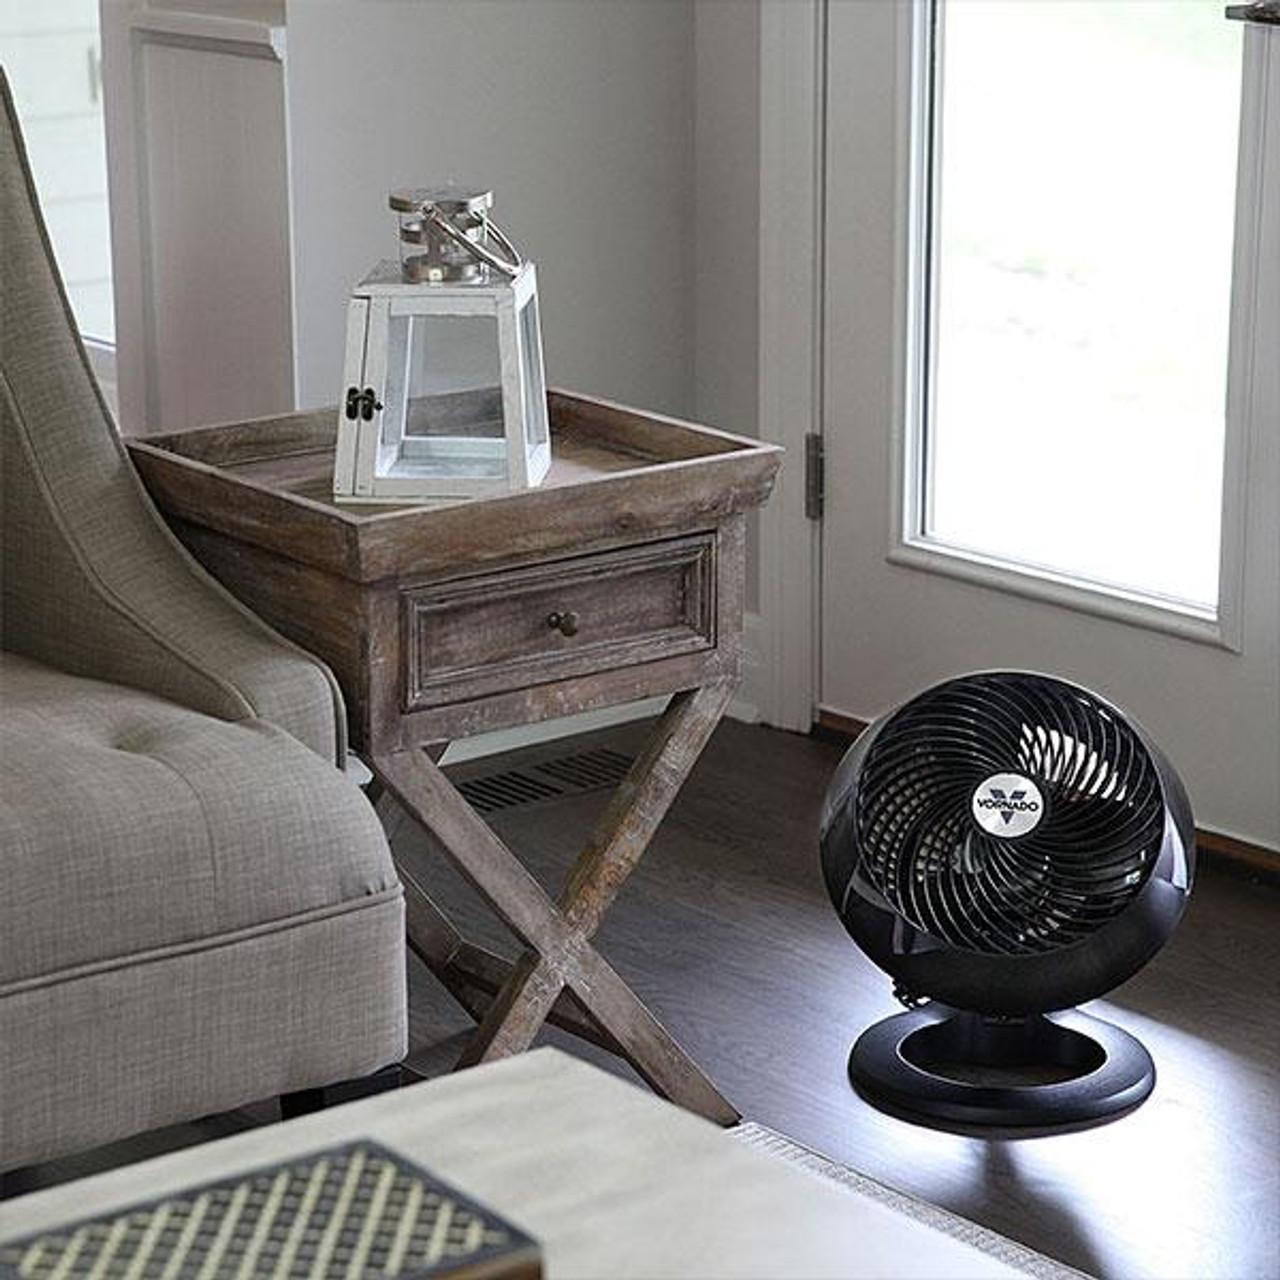 Vornado 71660 Large Air Circulator 25cm Floor Fan - Black - LAST 4!